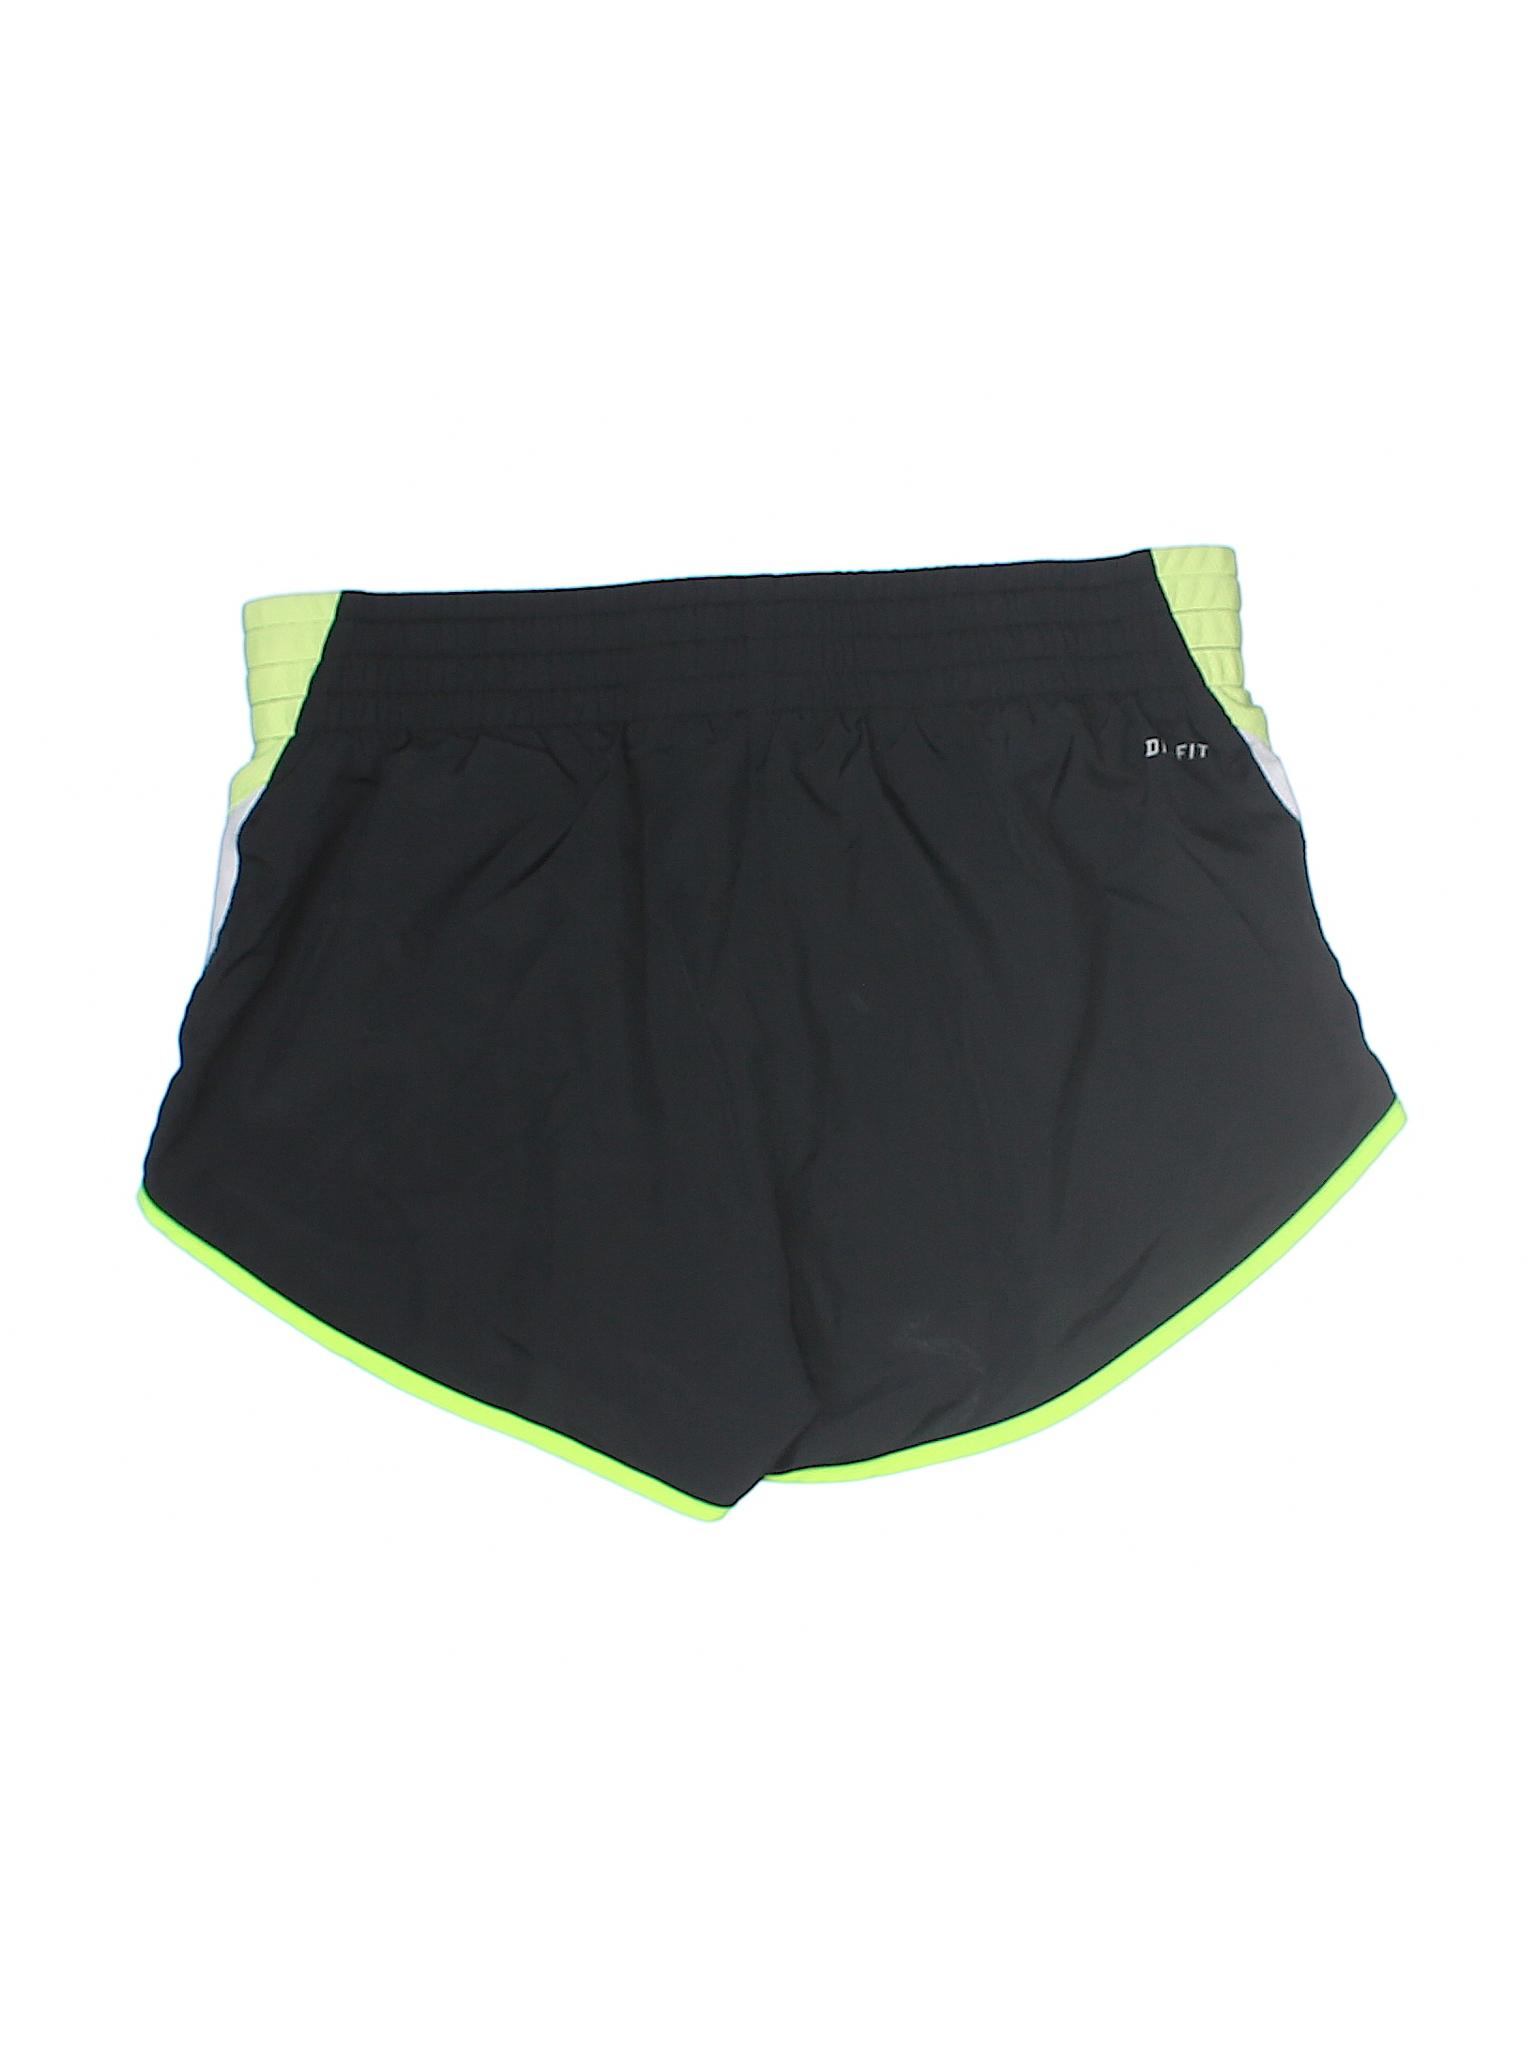 Boutique Nike Athletic Nike Shorts Boutique Boutique Boutique Athletic Shorts Athletic Nike Shorts Nike Anar6A